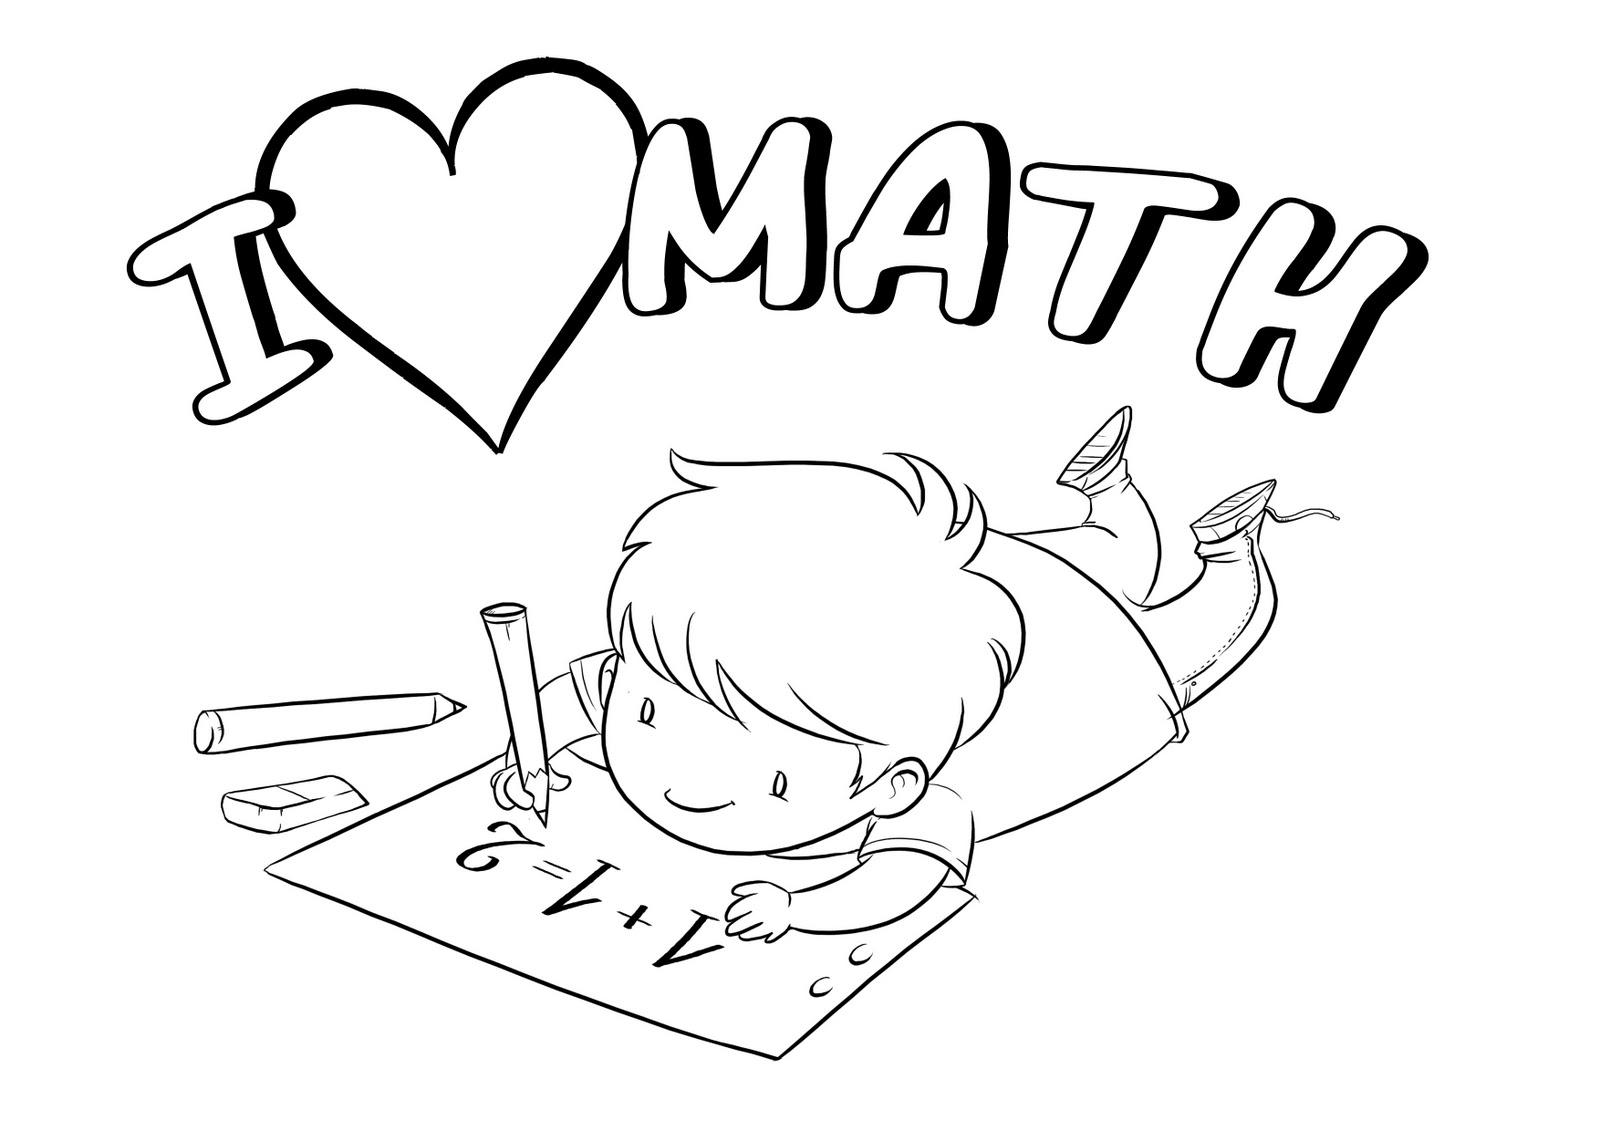 Monochrome clipart math #8